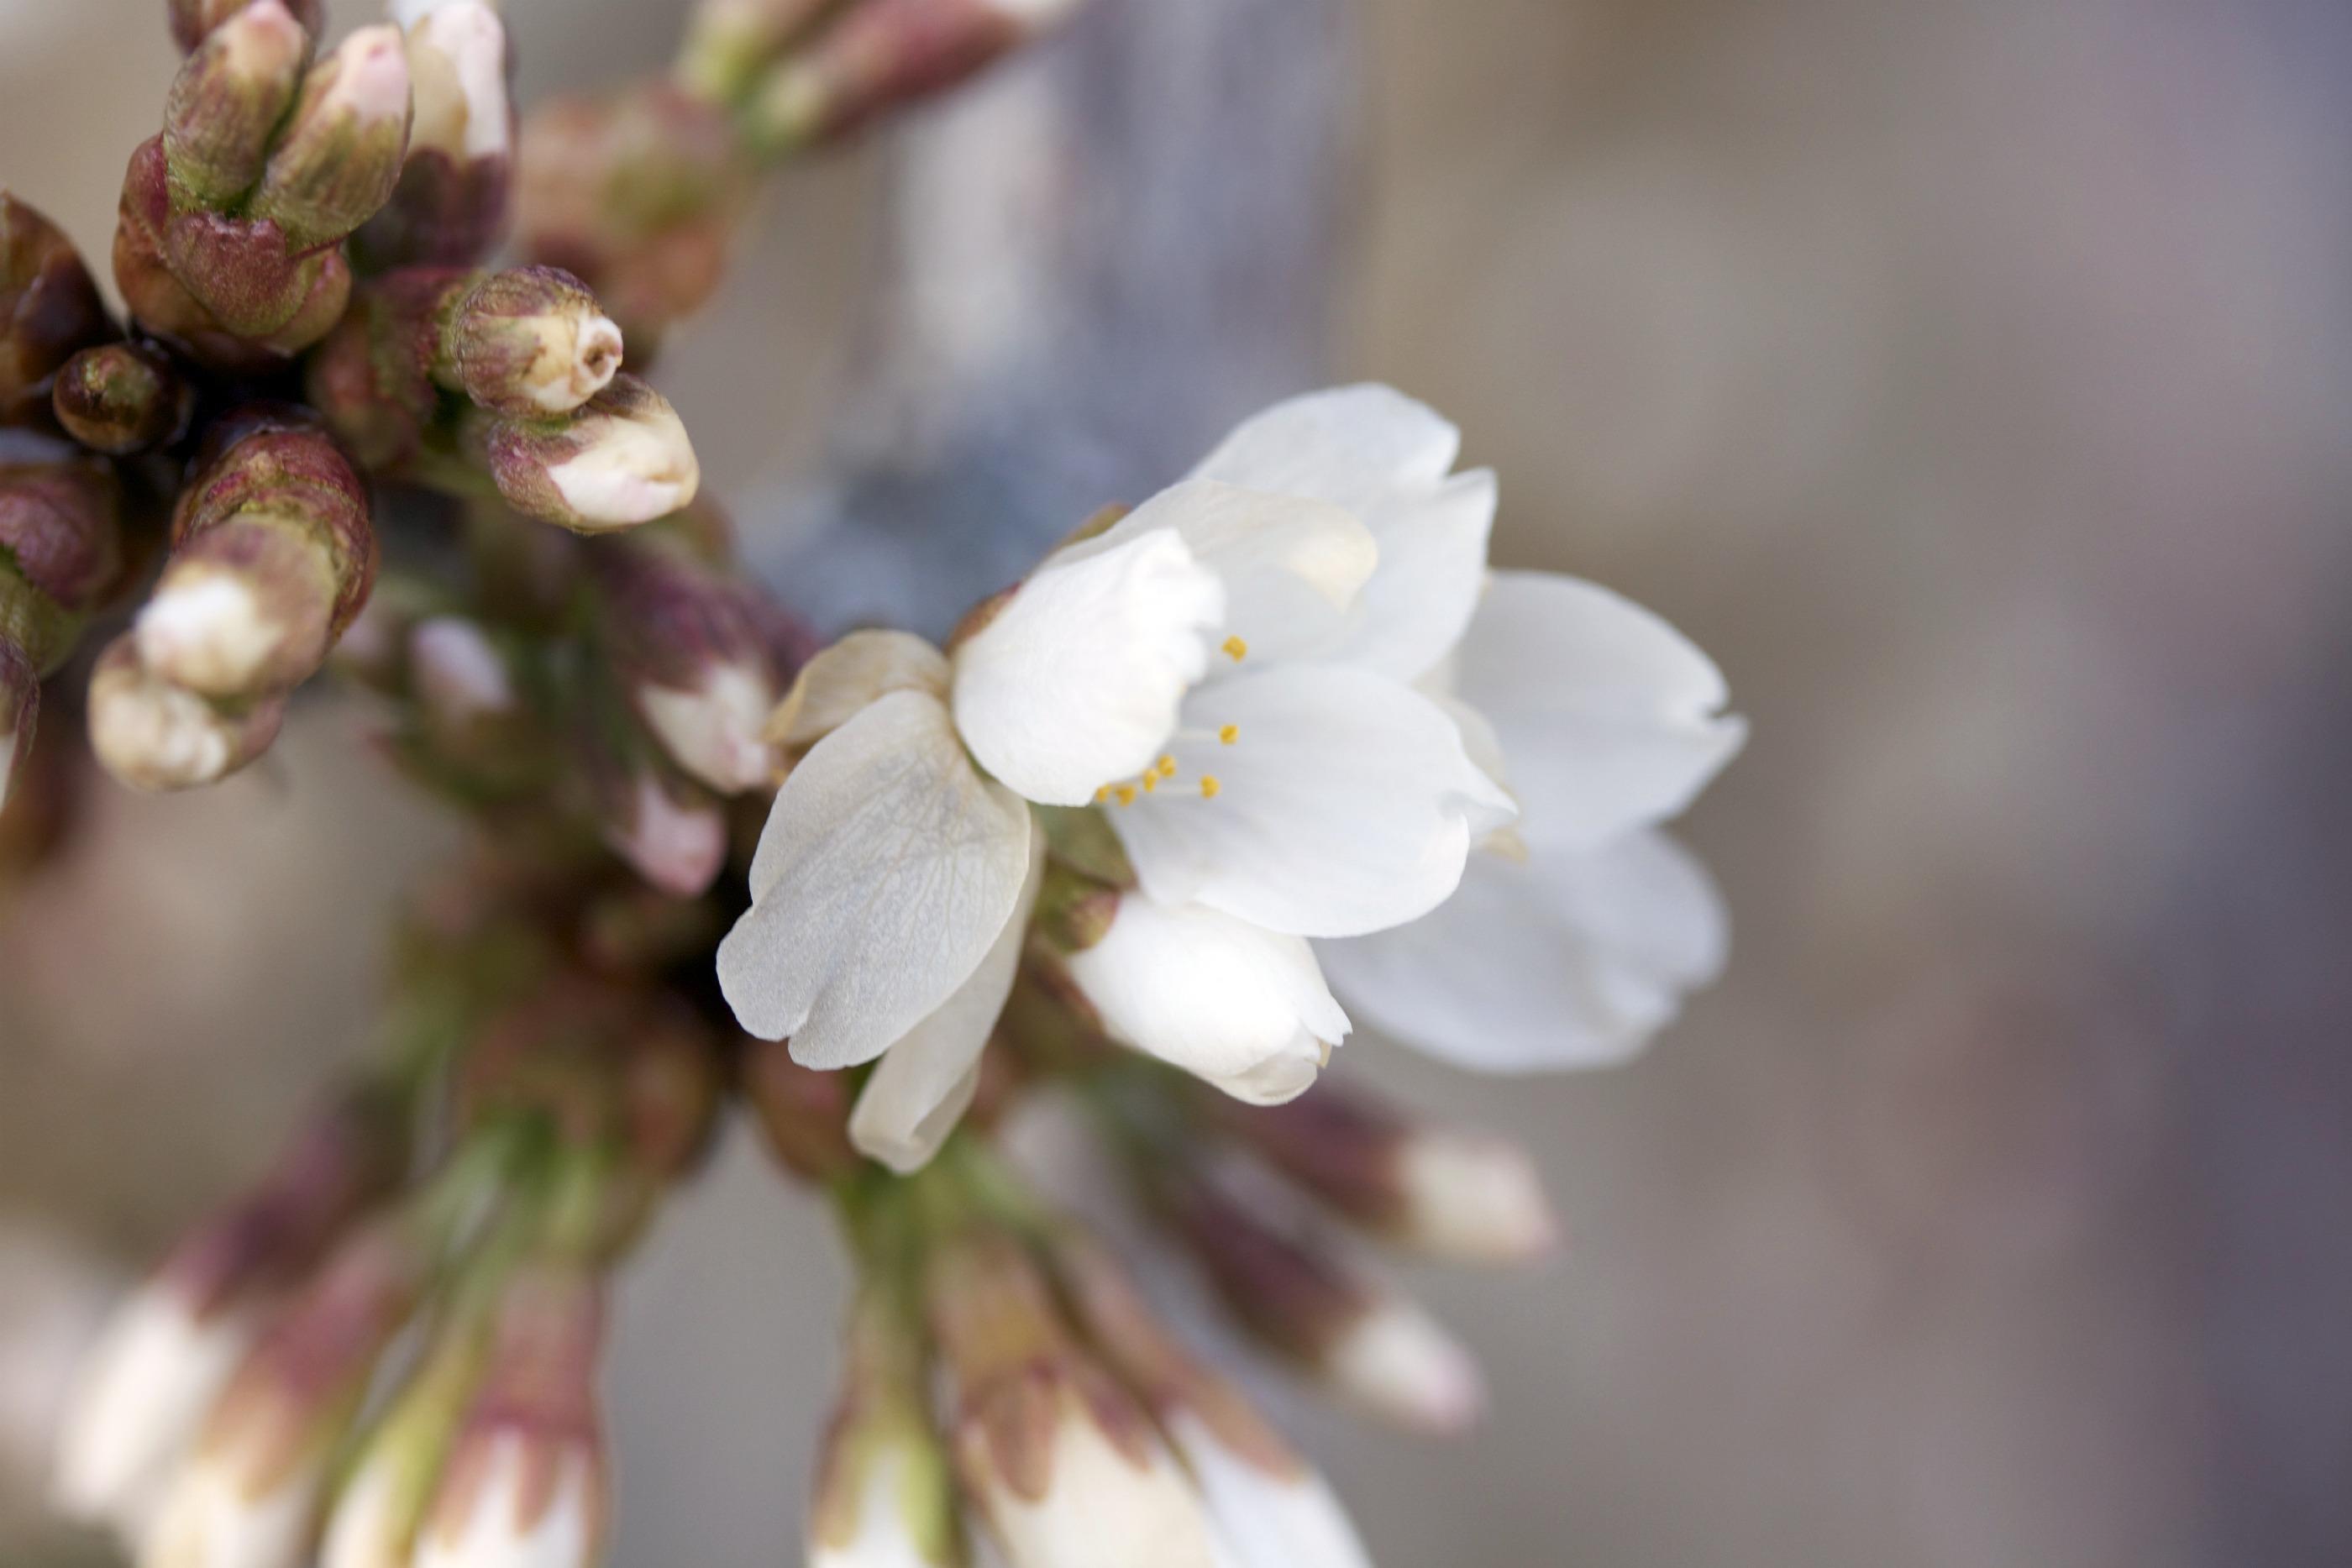 spring blossoms for spring event